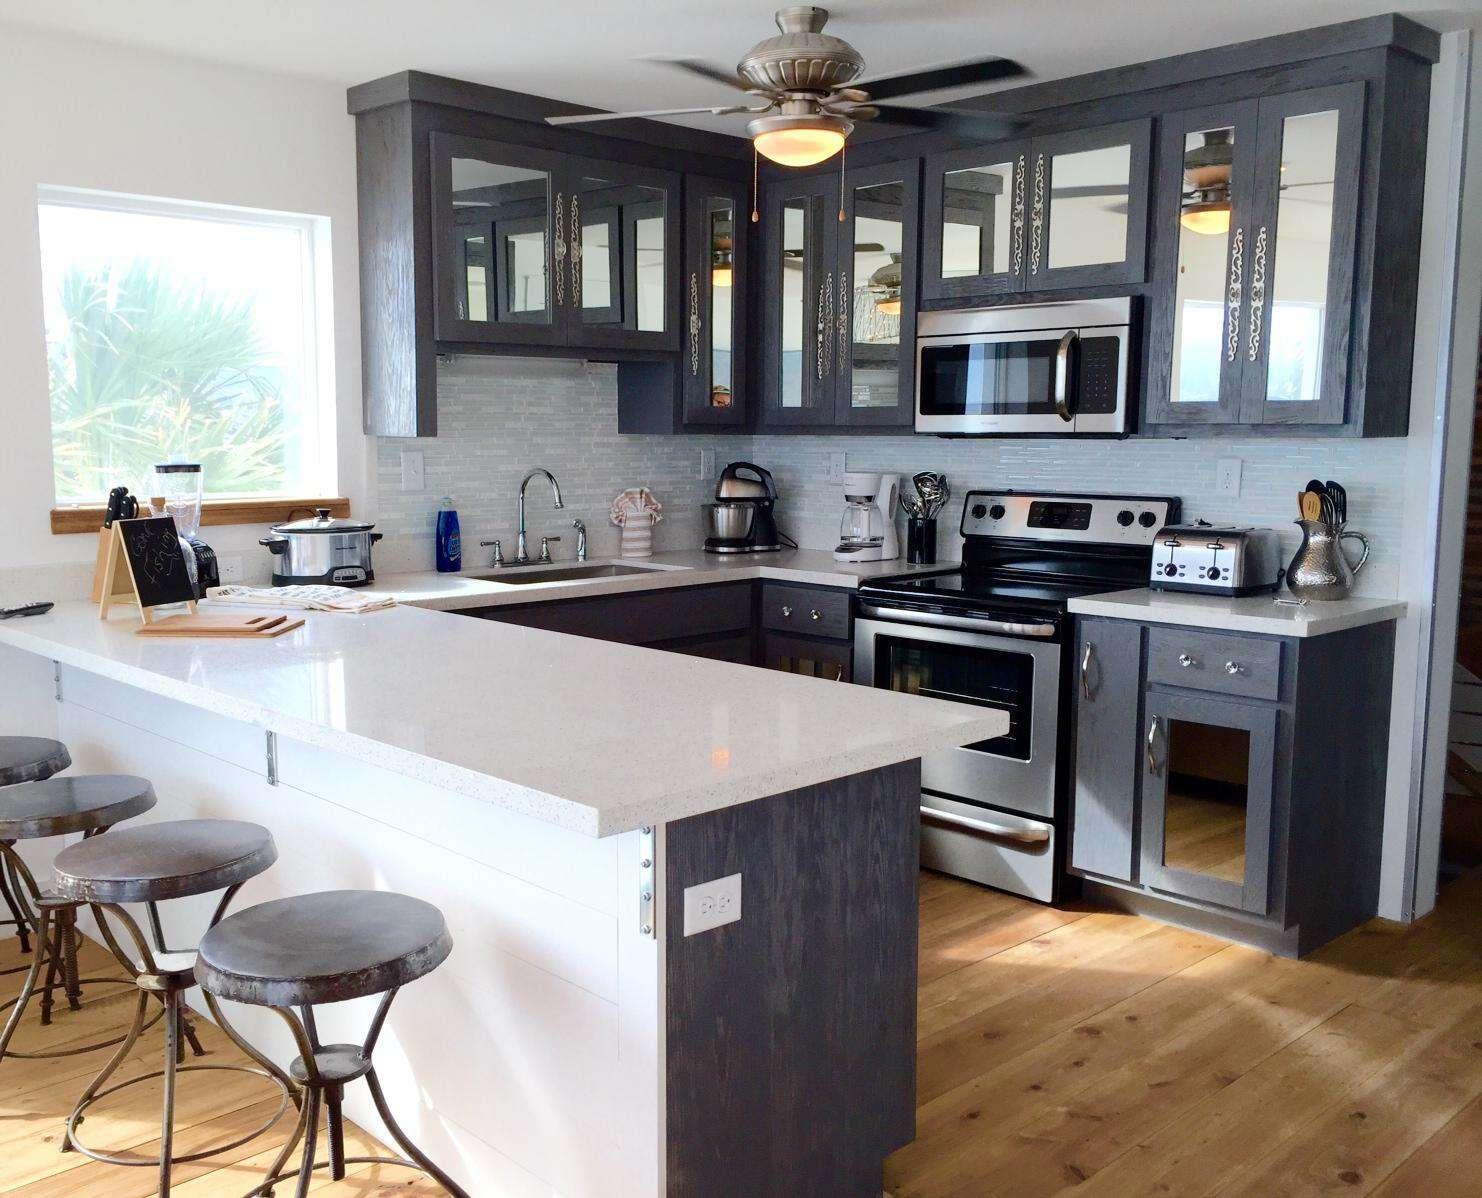 large kitchen, 2 side by side refrigerators